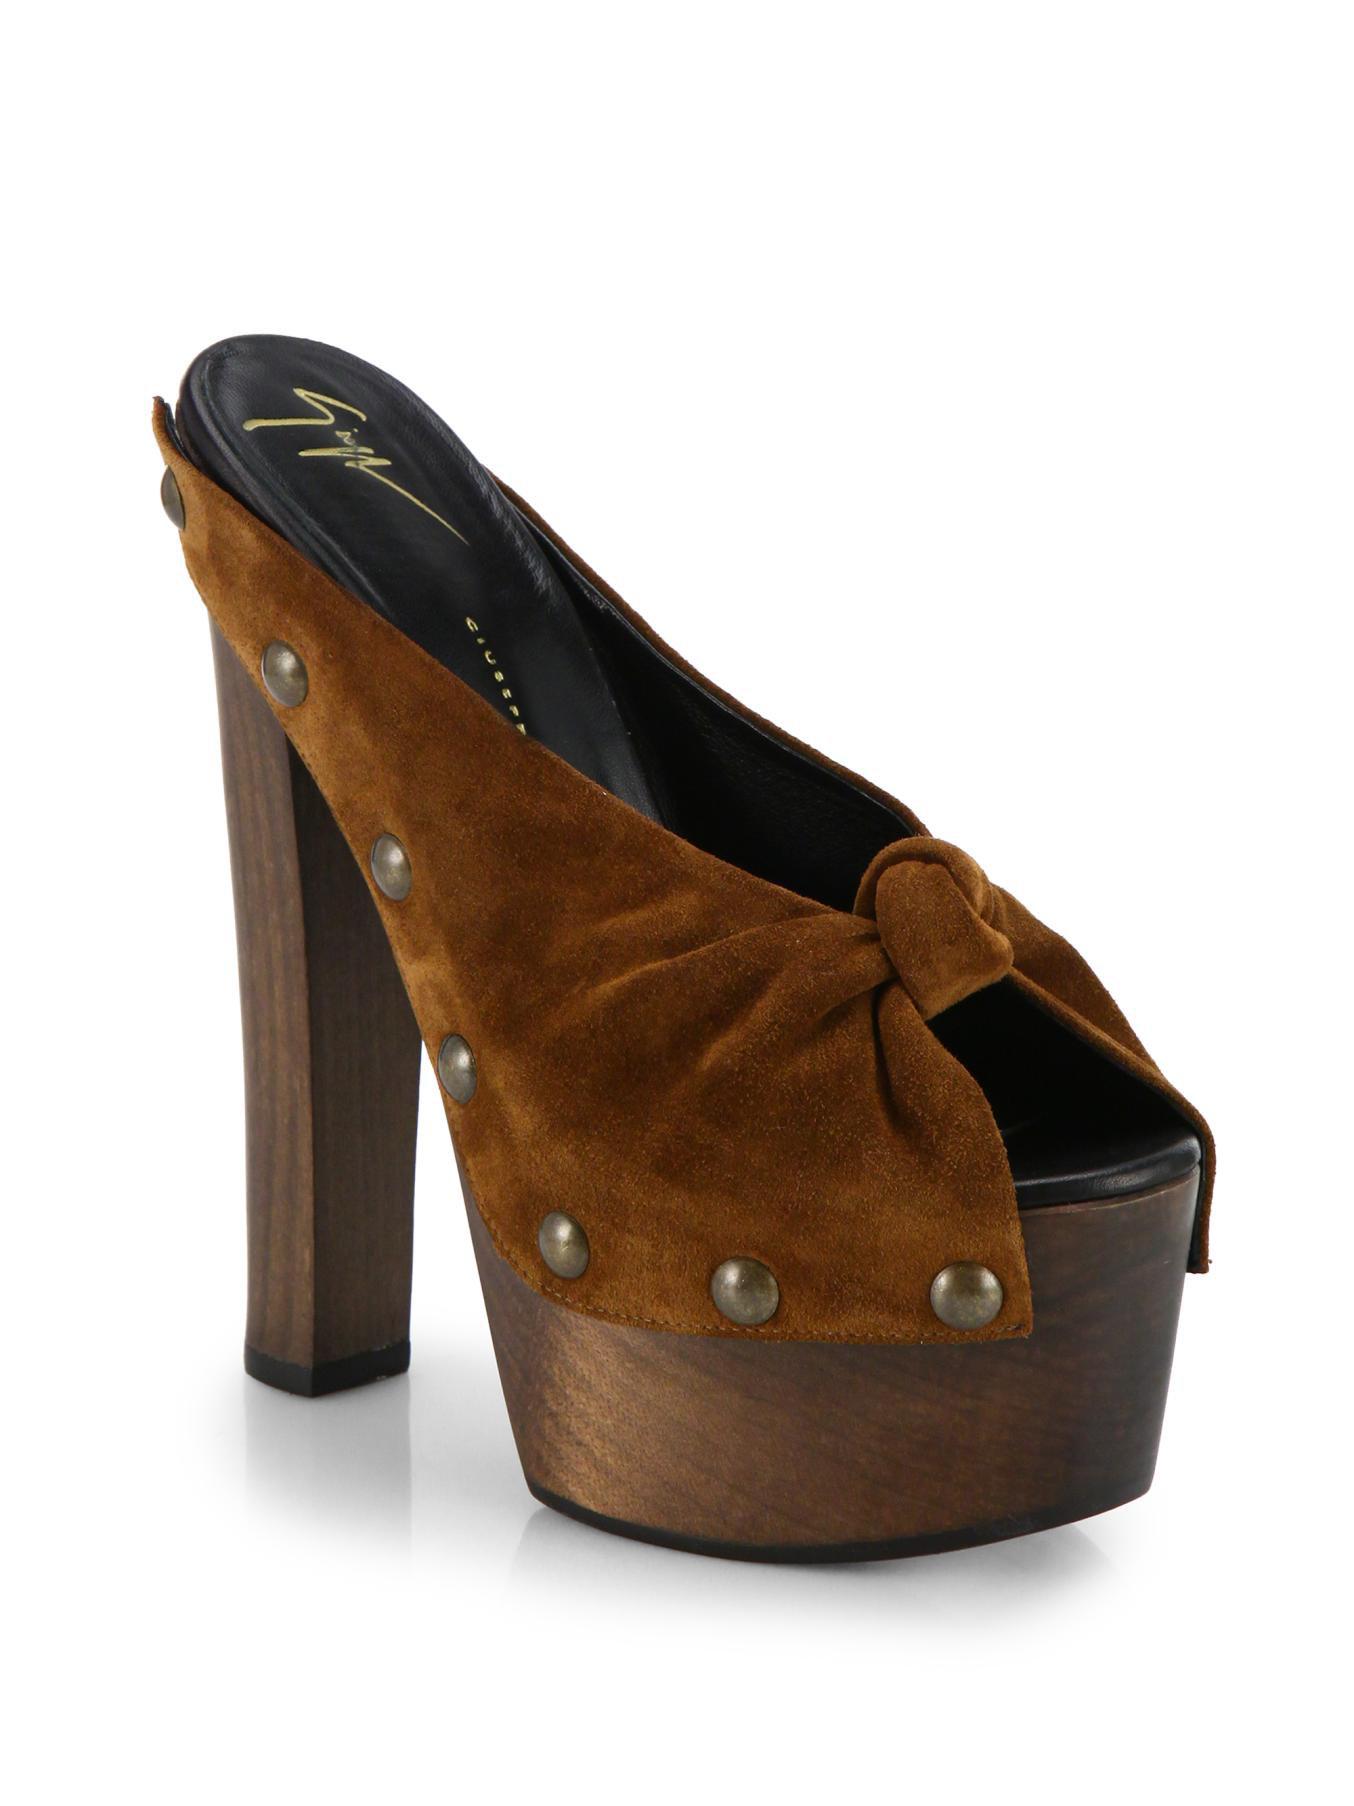 giuseppe zanotti studded suede wooden platform sandals in